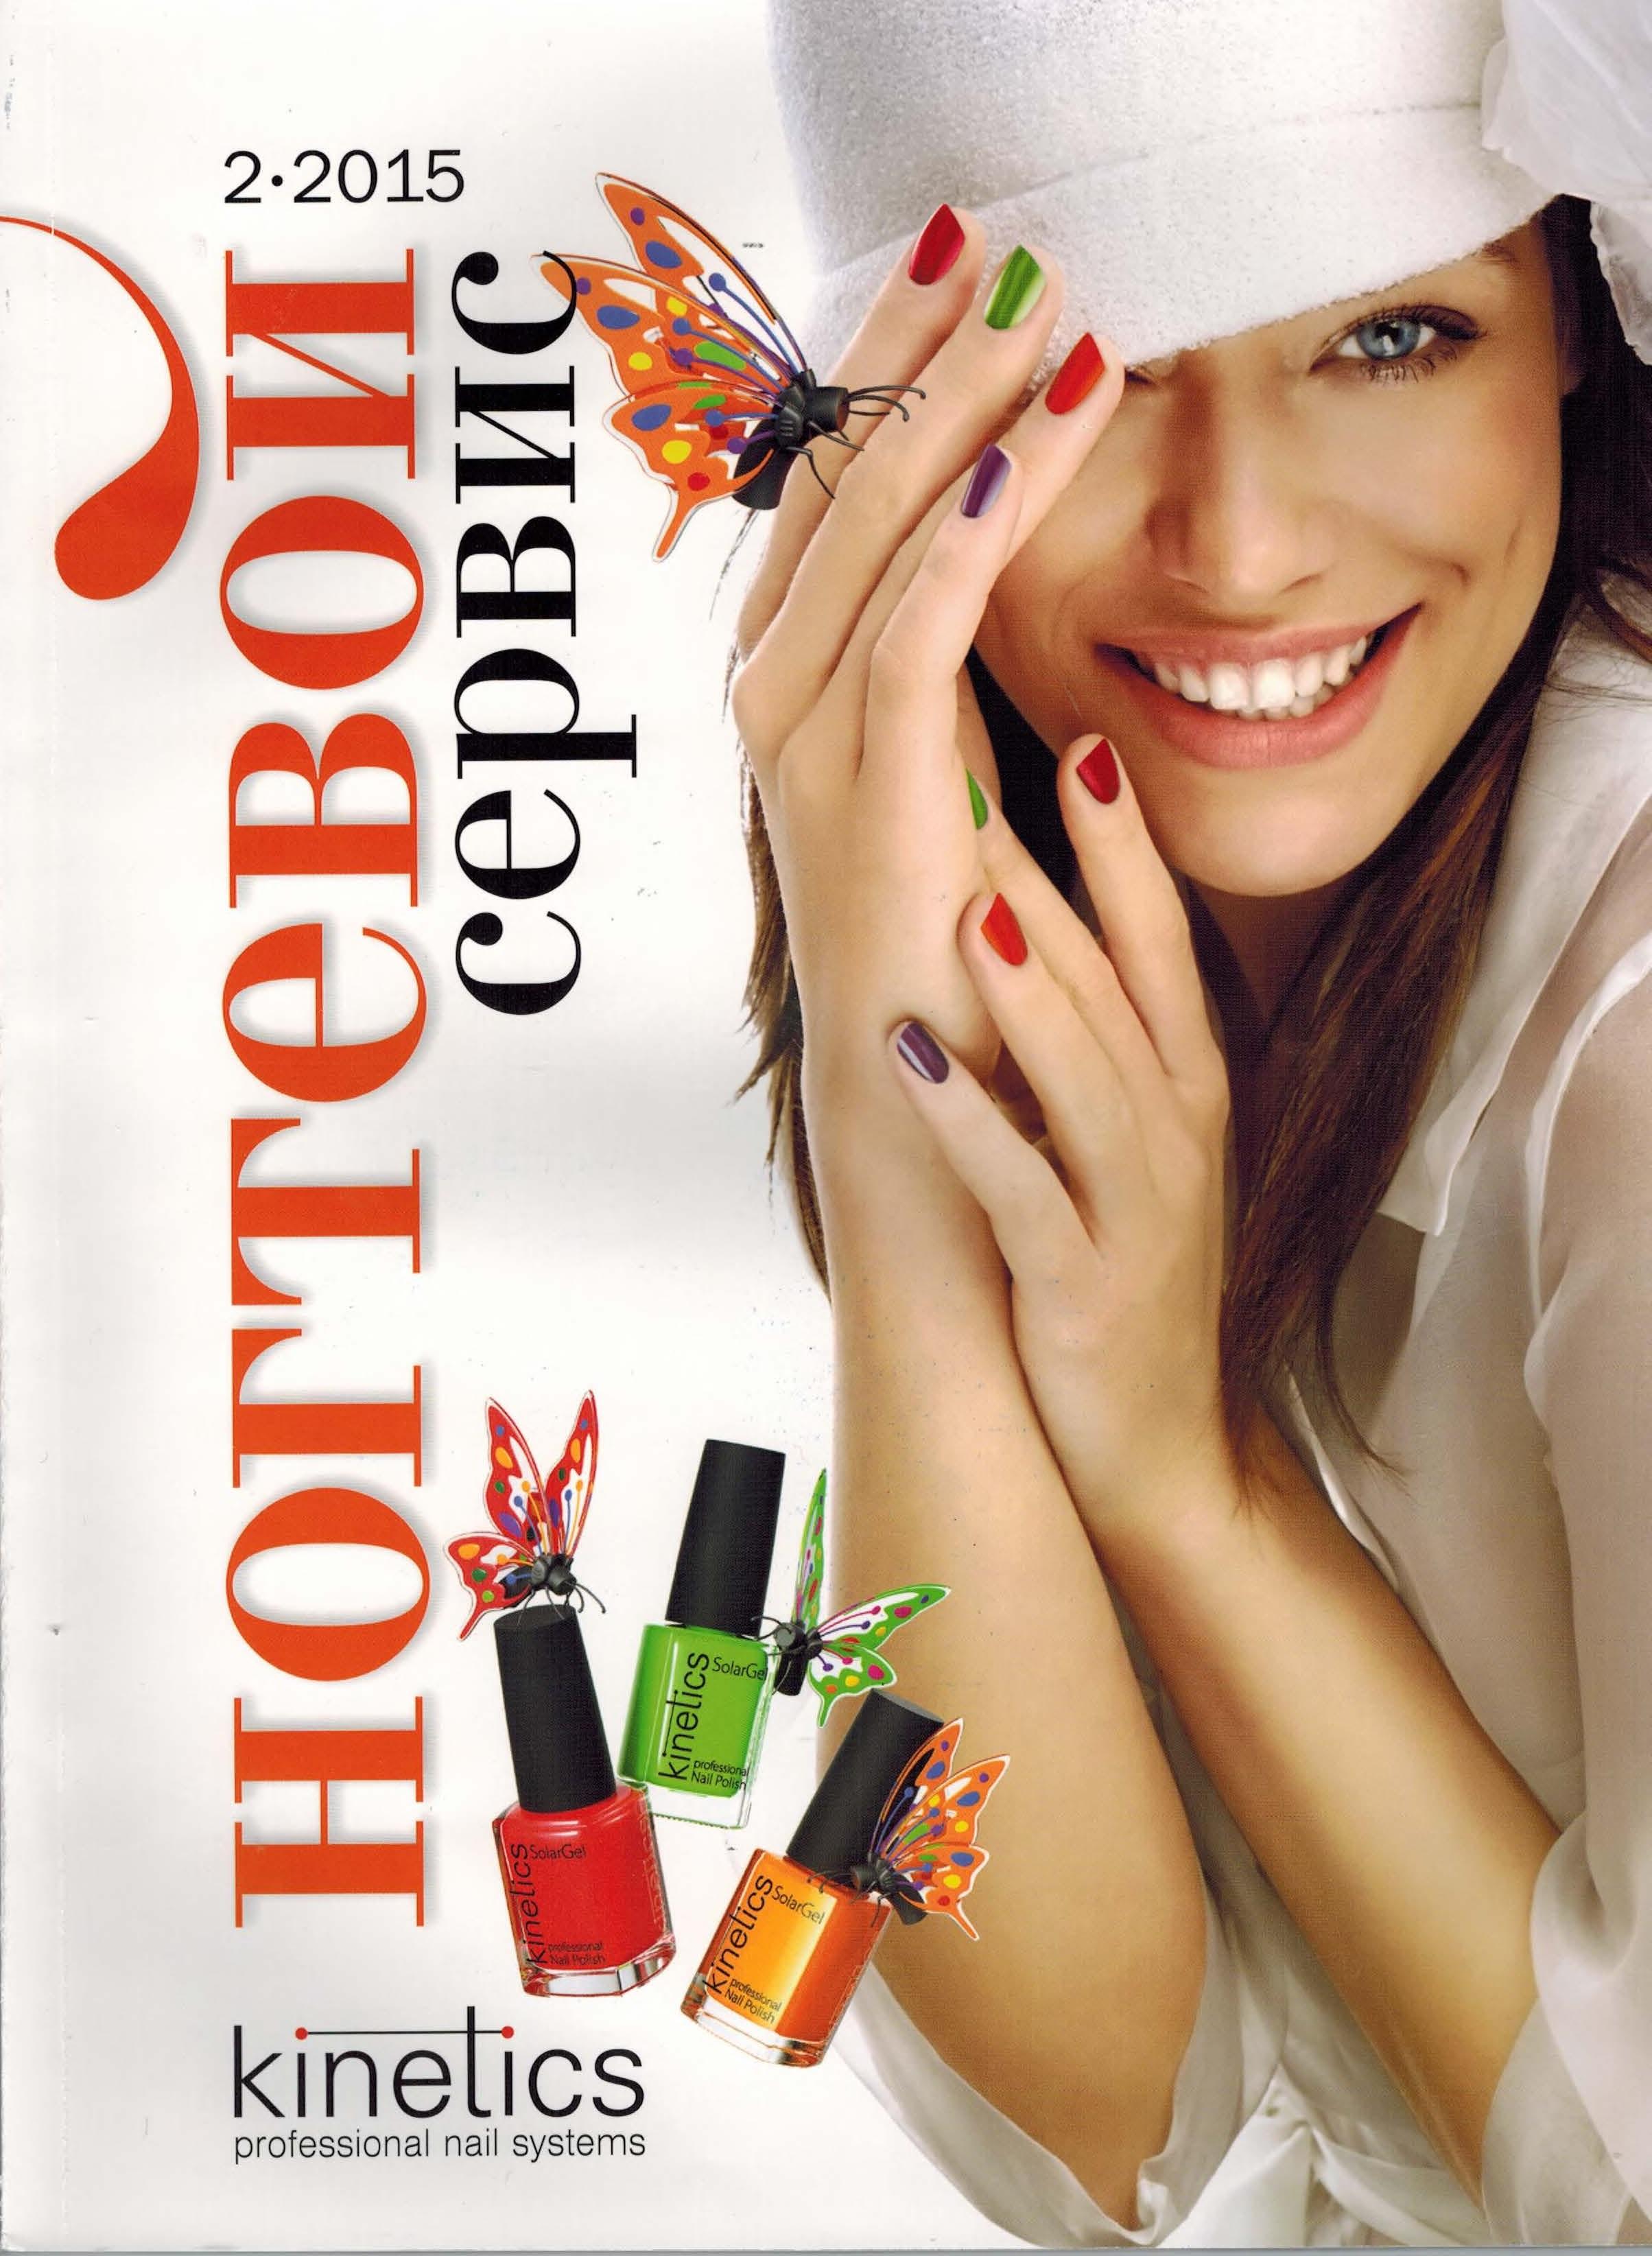 Журнал ногтевой сервис креативные фото 2